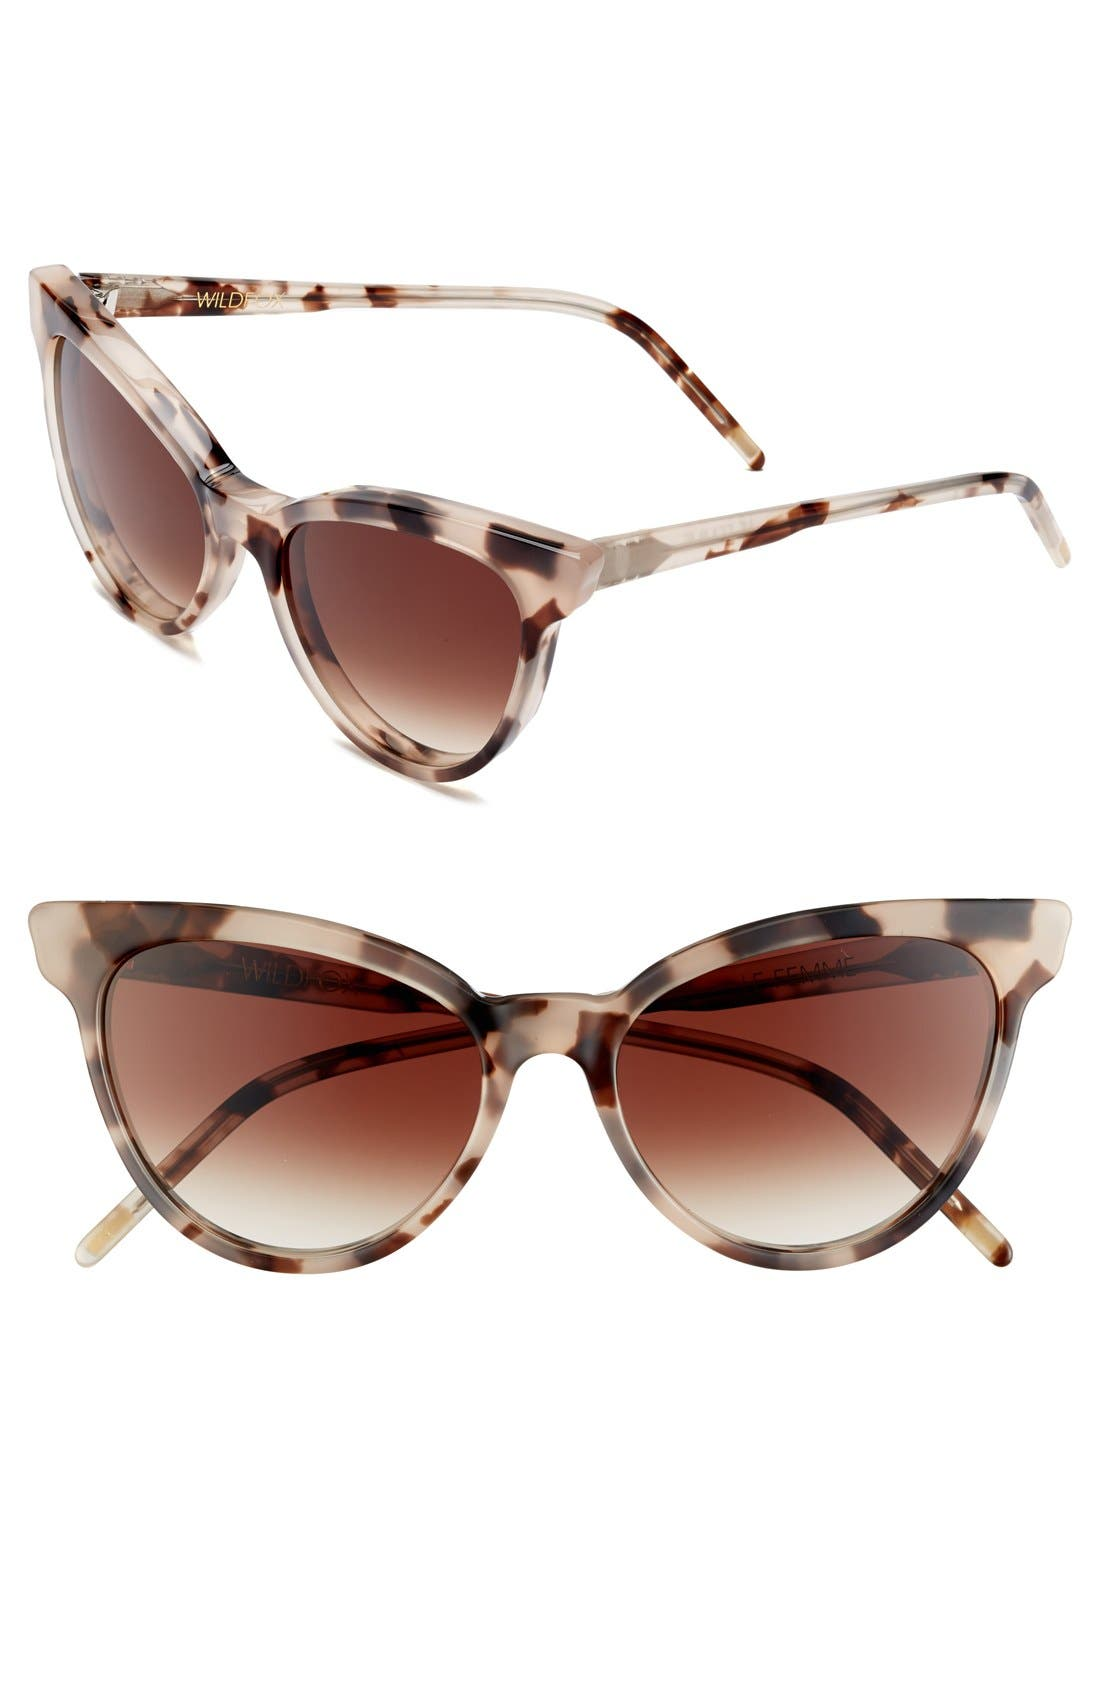 Main Image - Wildfox 'La Femme' 55mm Sunglasses